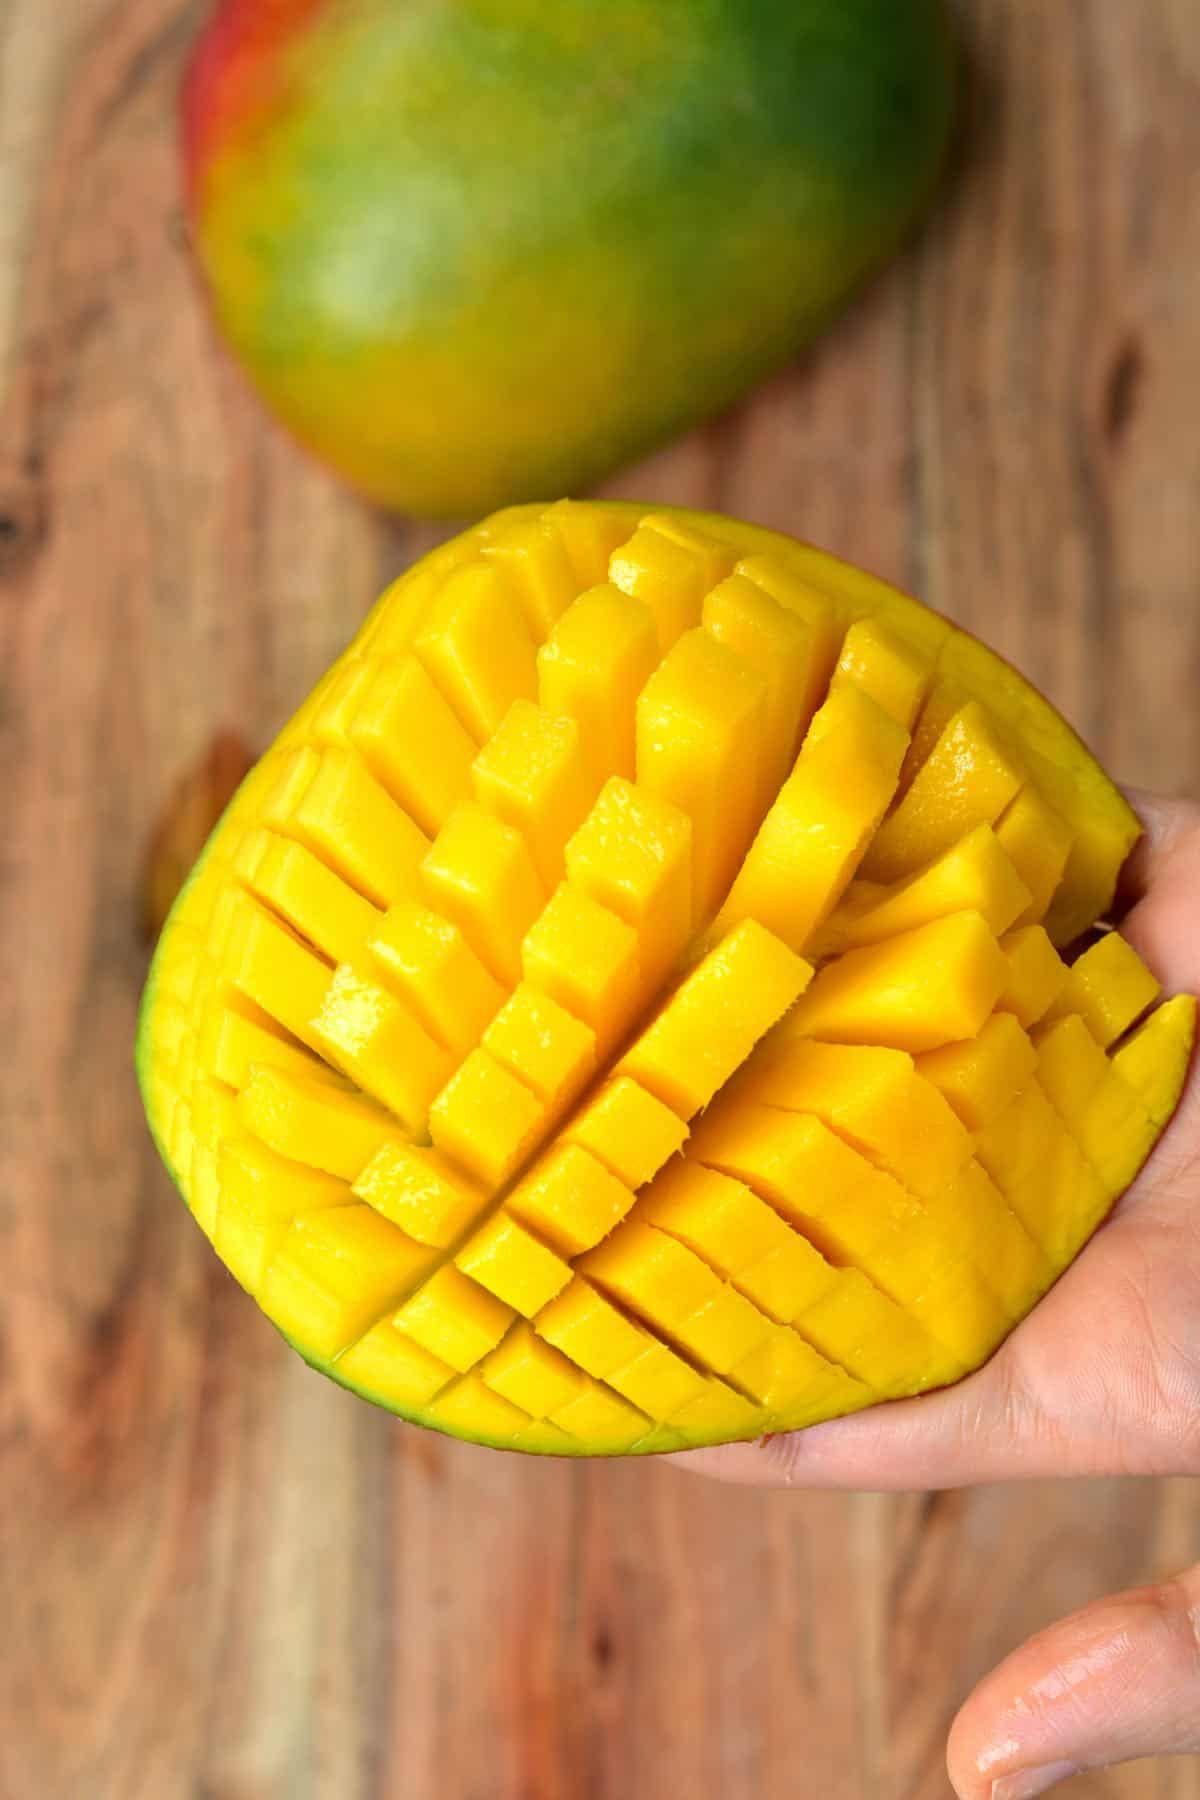 Diced mango half